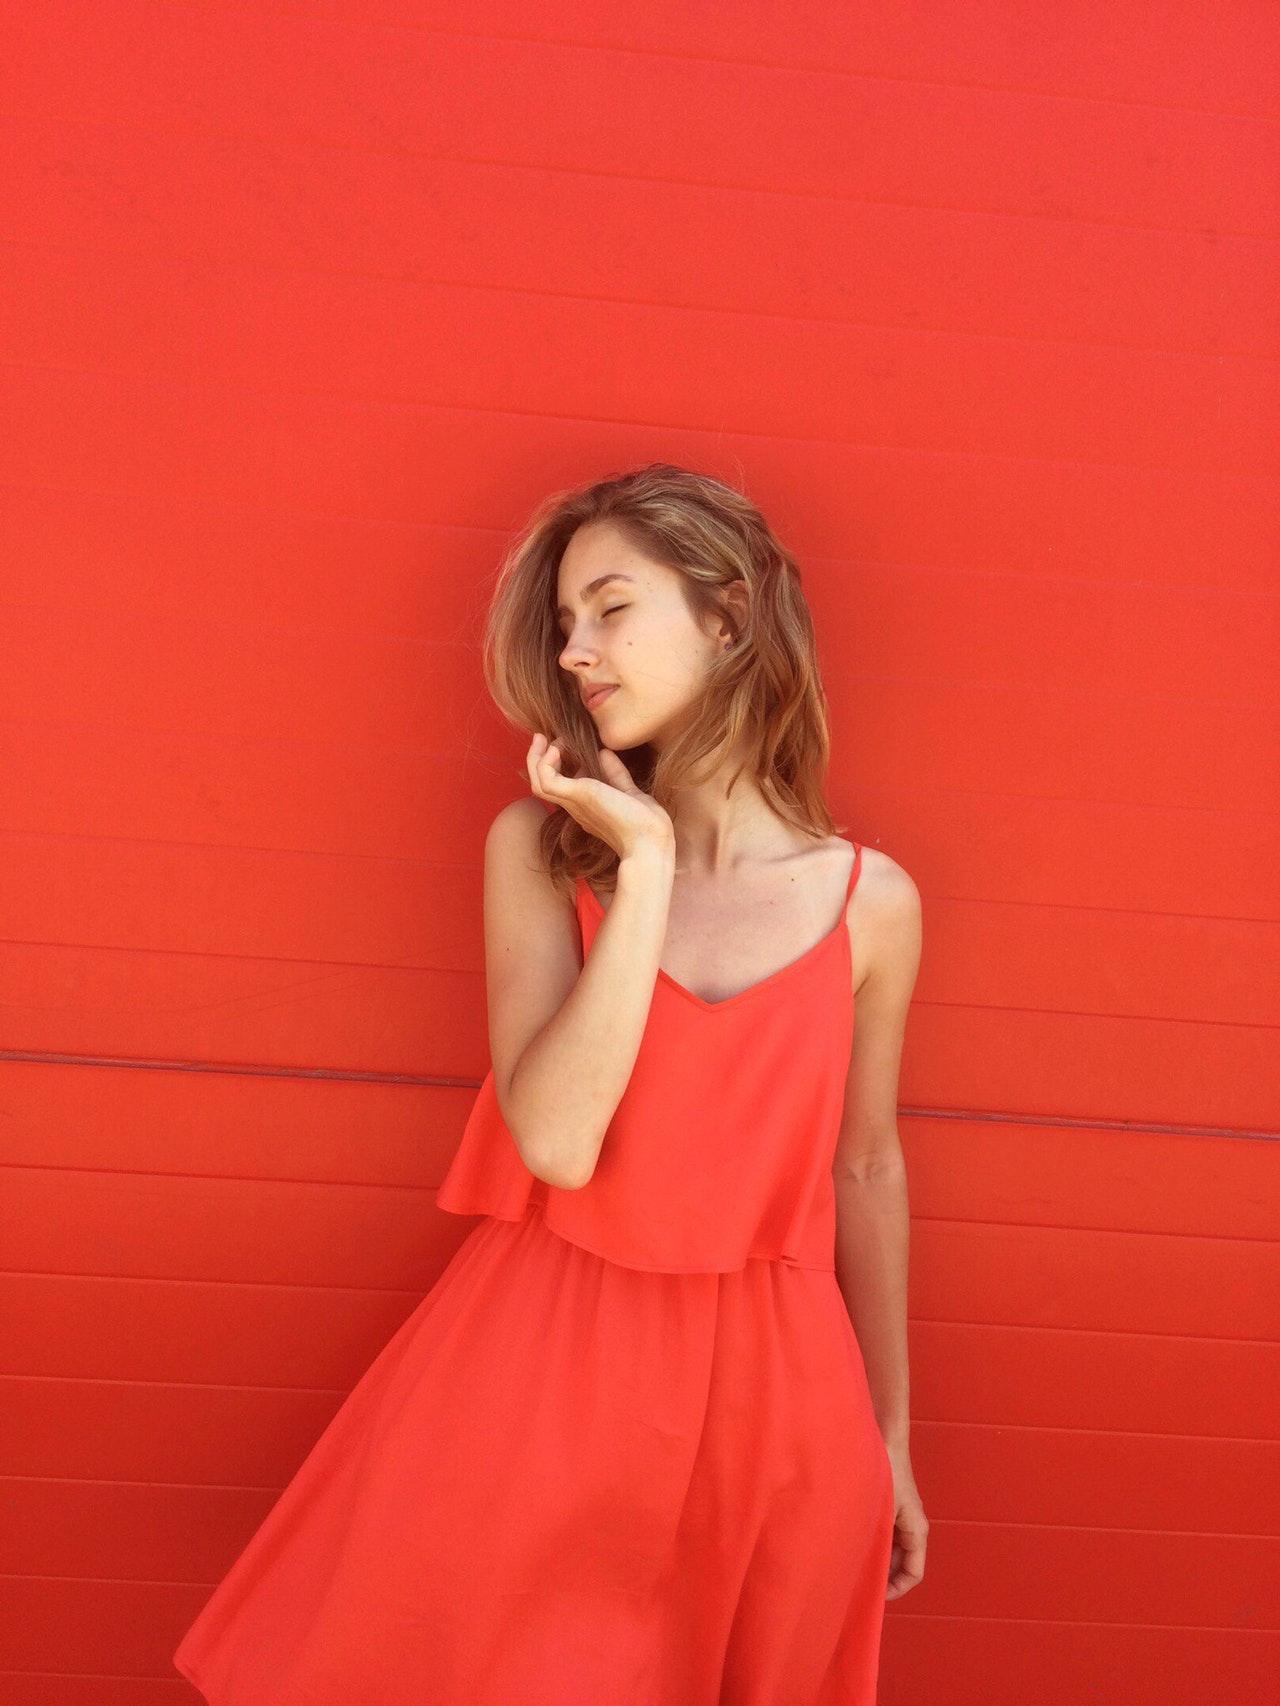 Finland's Down's model Maija makes strides on catwalk